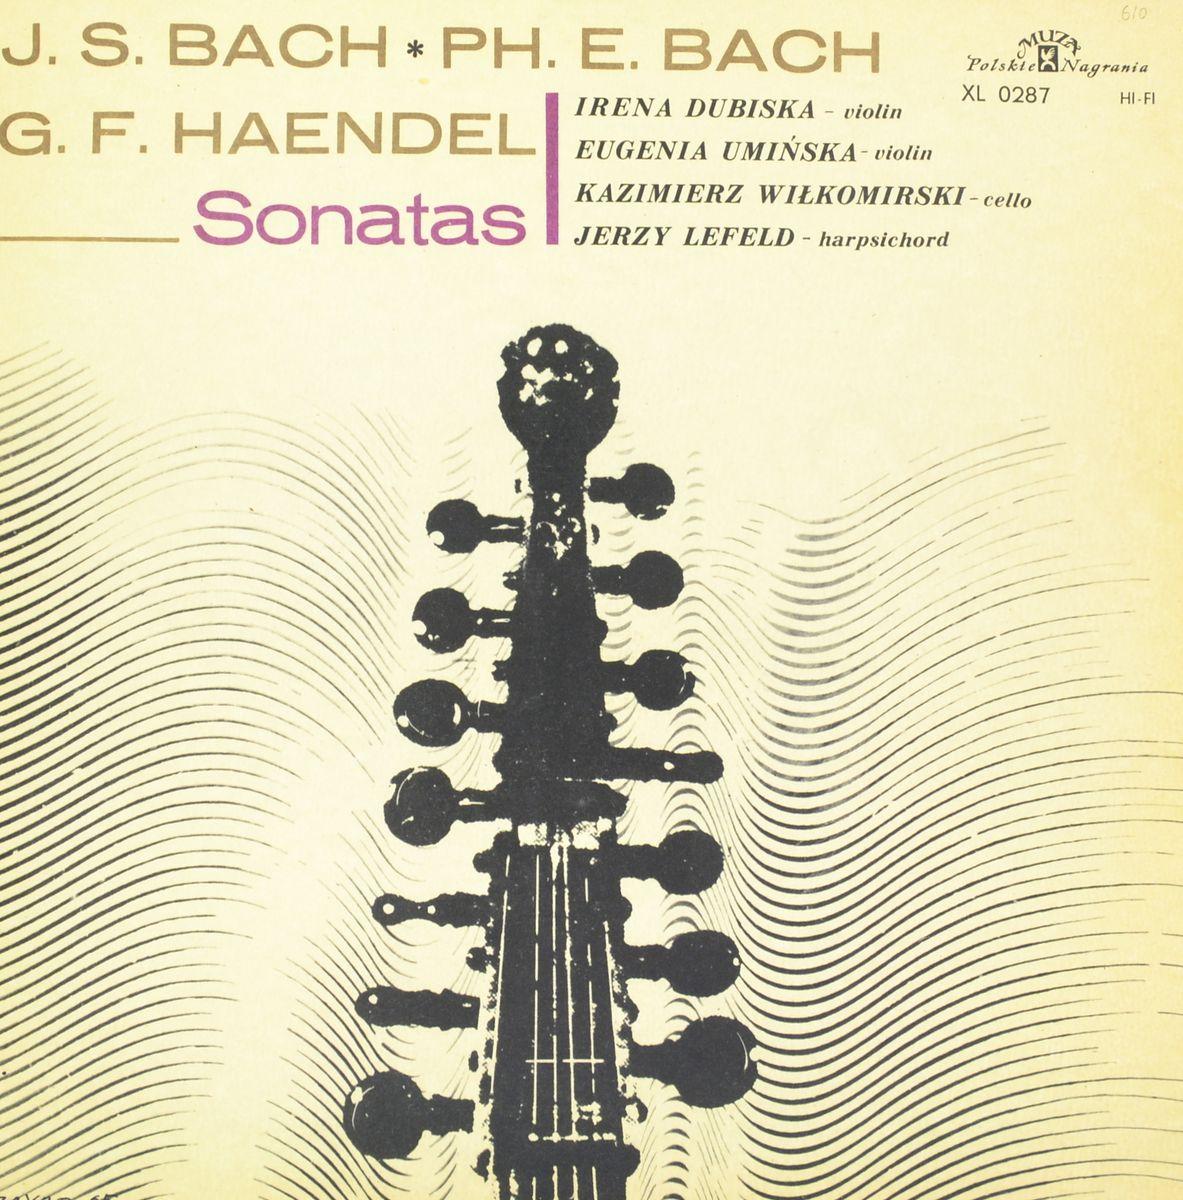 Johann Sebastian Bach, Georg Friedrich Handel – Sonatas (LP) bach bachyo yo ma chris thile edgar meyer trios 2 lp